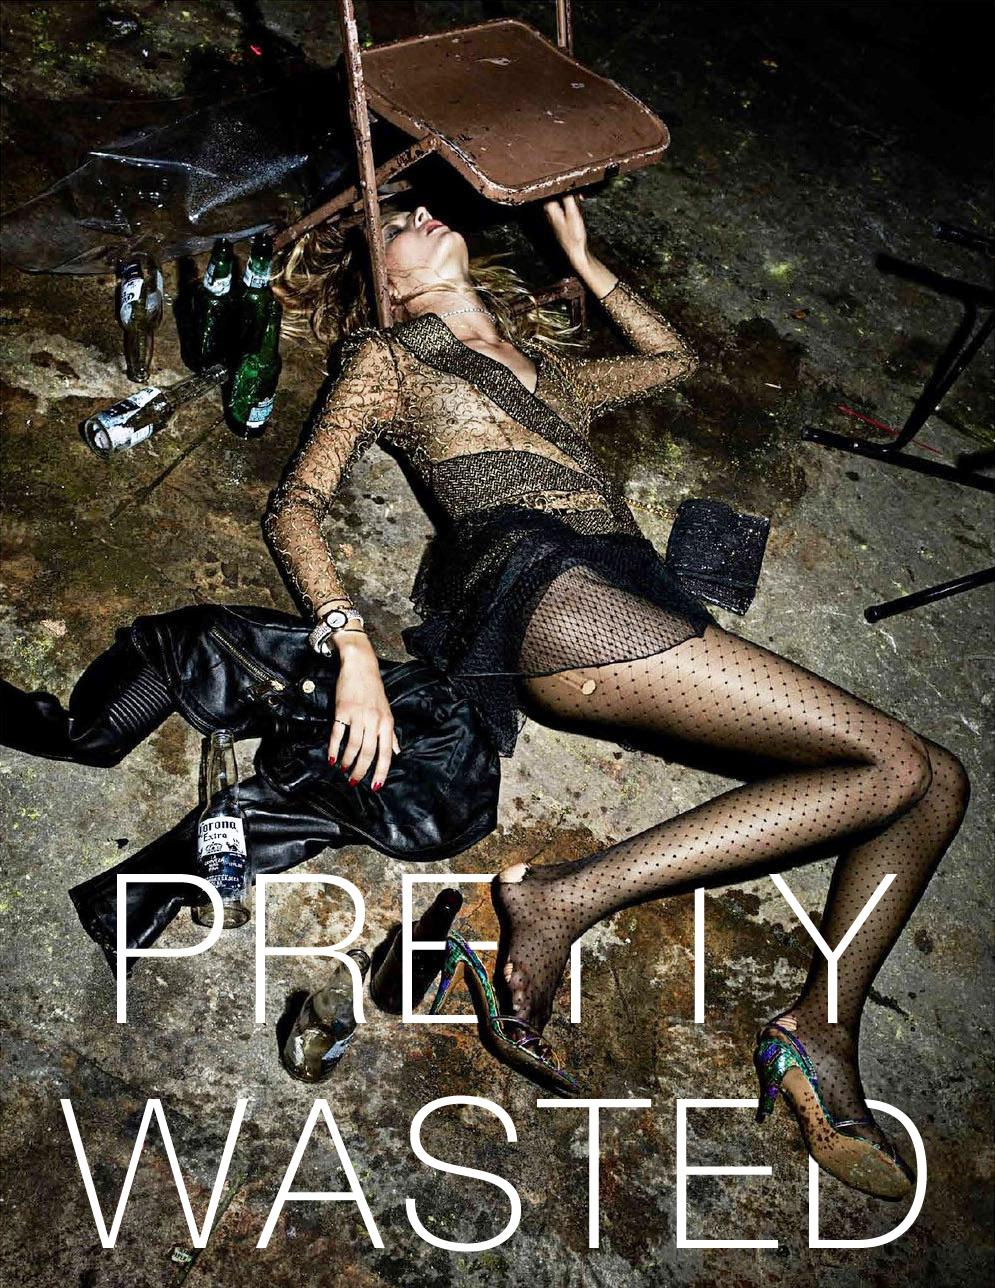 Interview Magazine's 'Pretty Wasted' Editorial is Pretty Disturbing